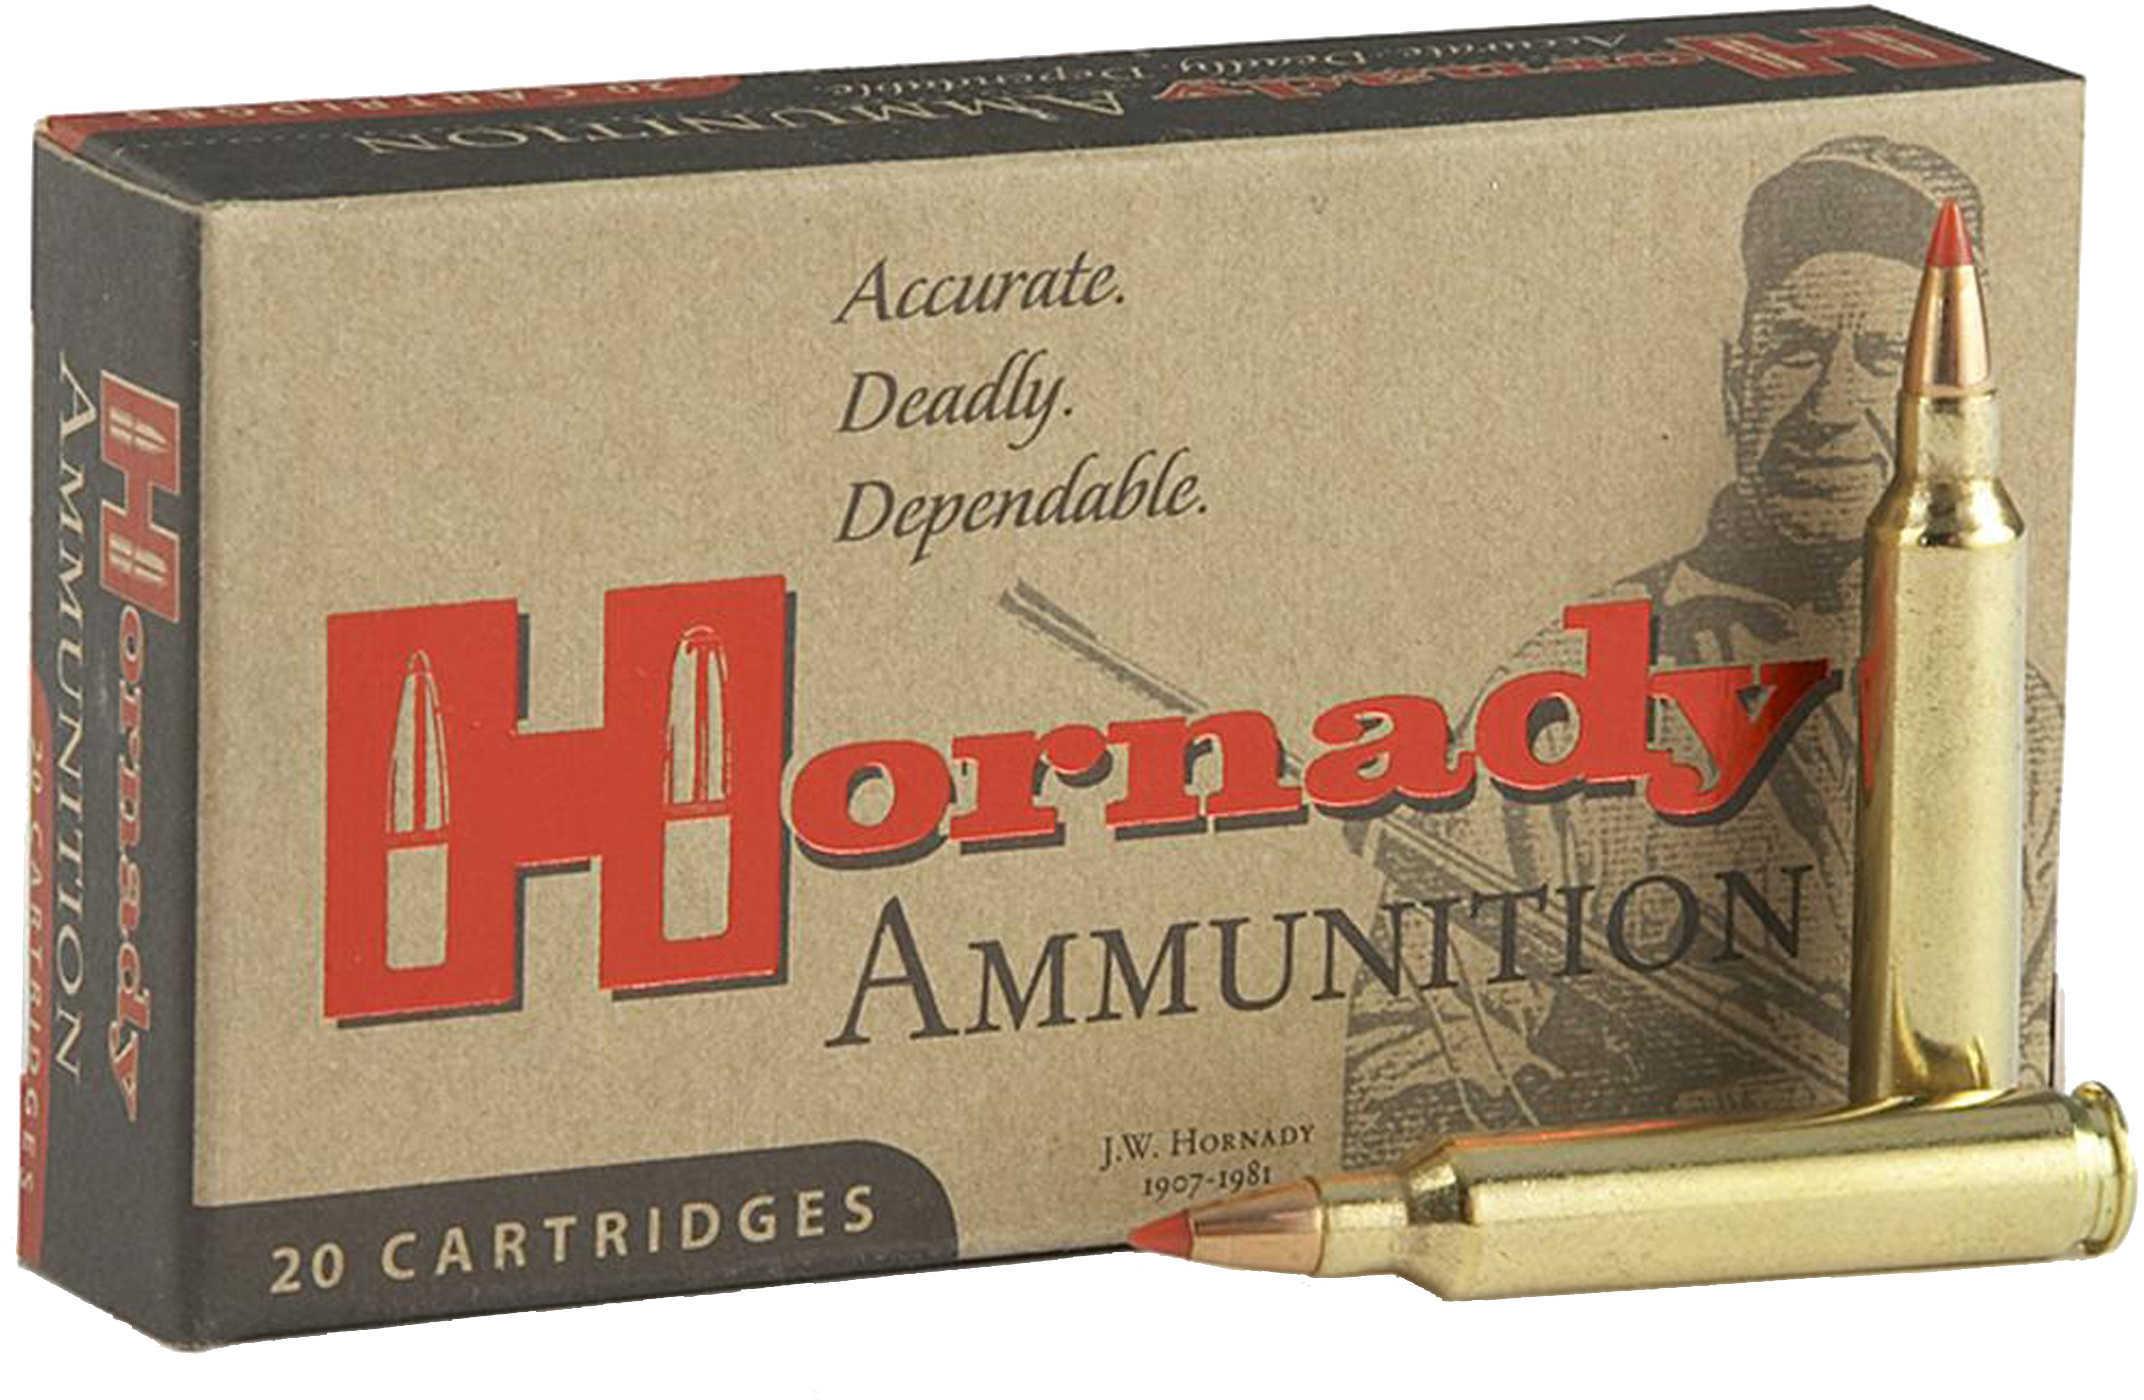 338 Lapua Ammunition By Hornady 250 Grain BTHP Per 20 Md: 8230